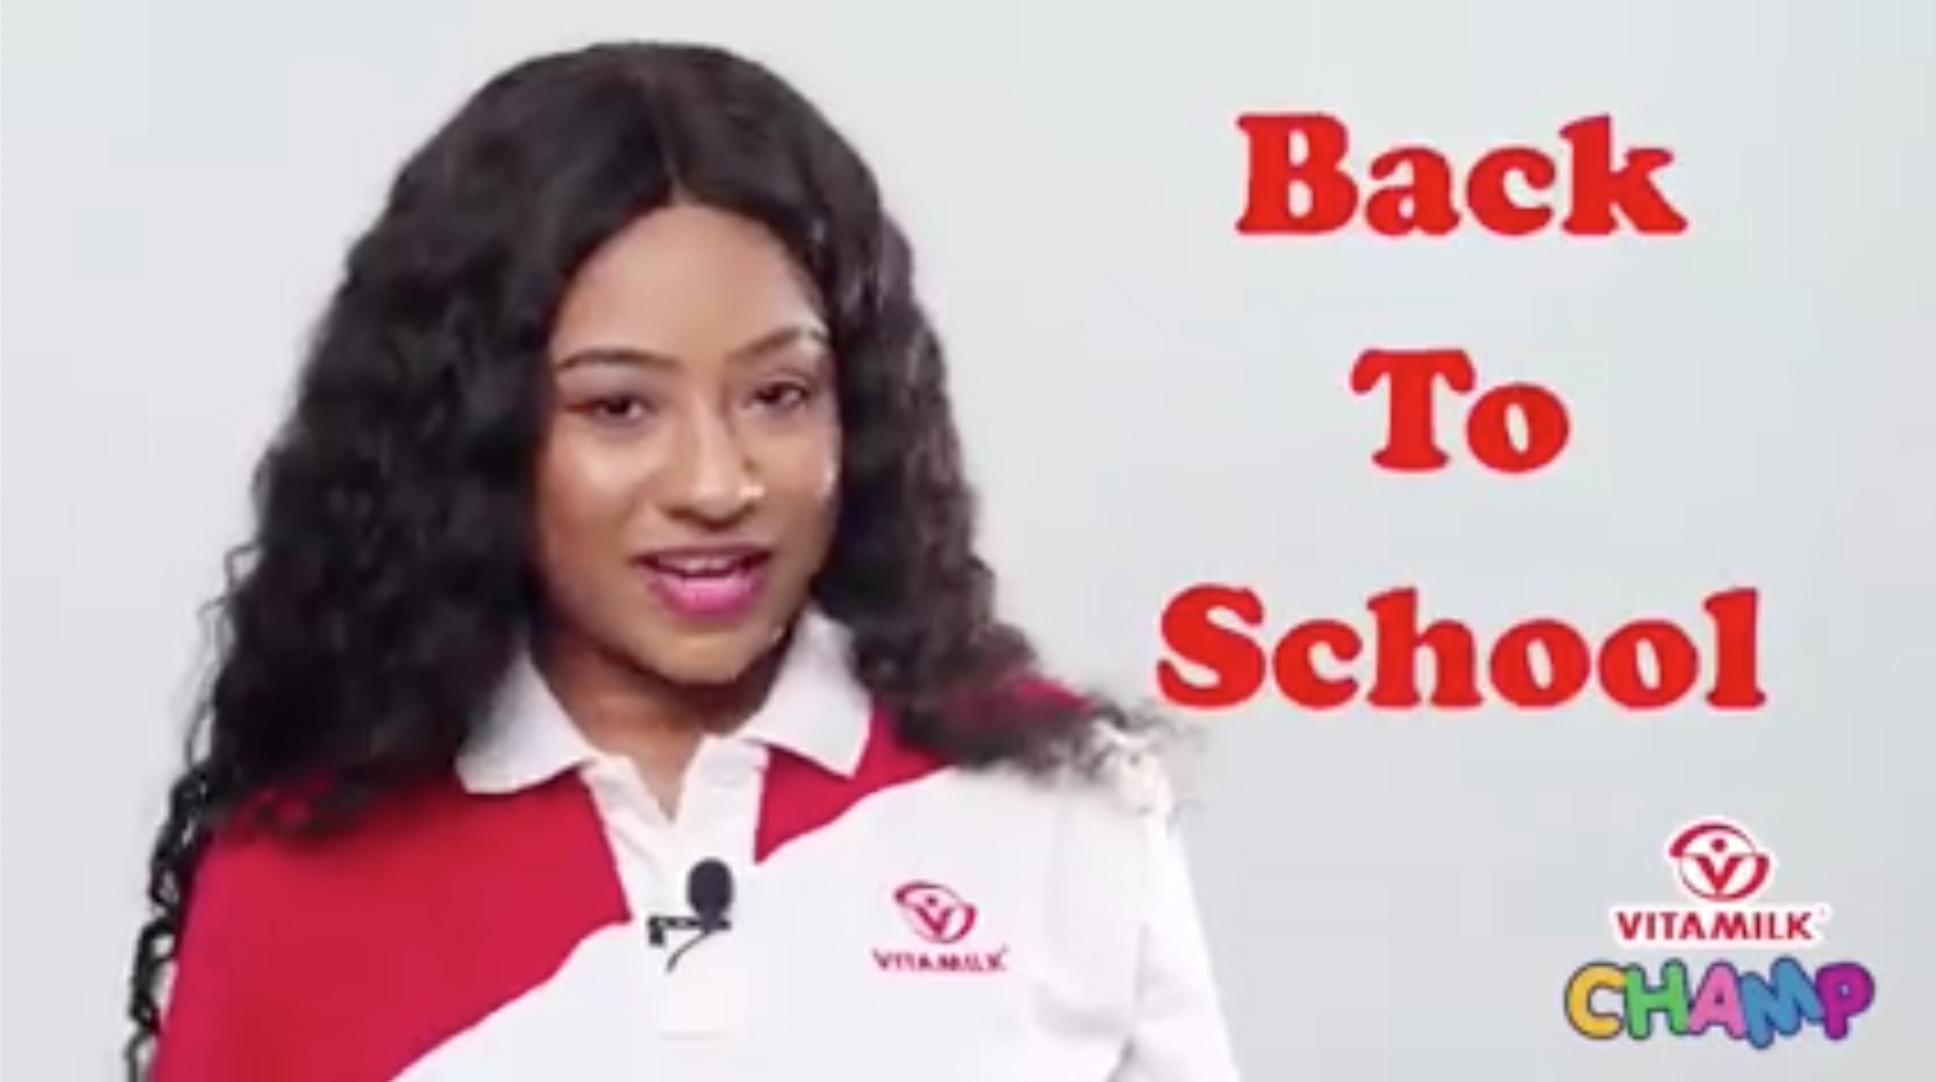 VITAMILK GHANA SUPPORTS KIDS IN NEW BACK TO SCHOOL INITIATIVE